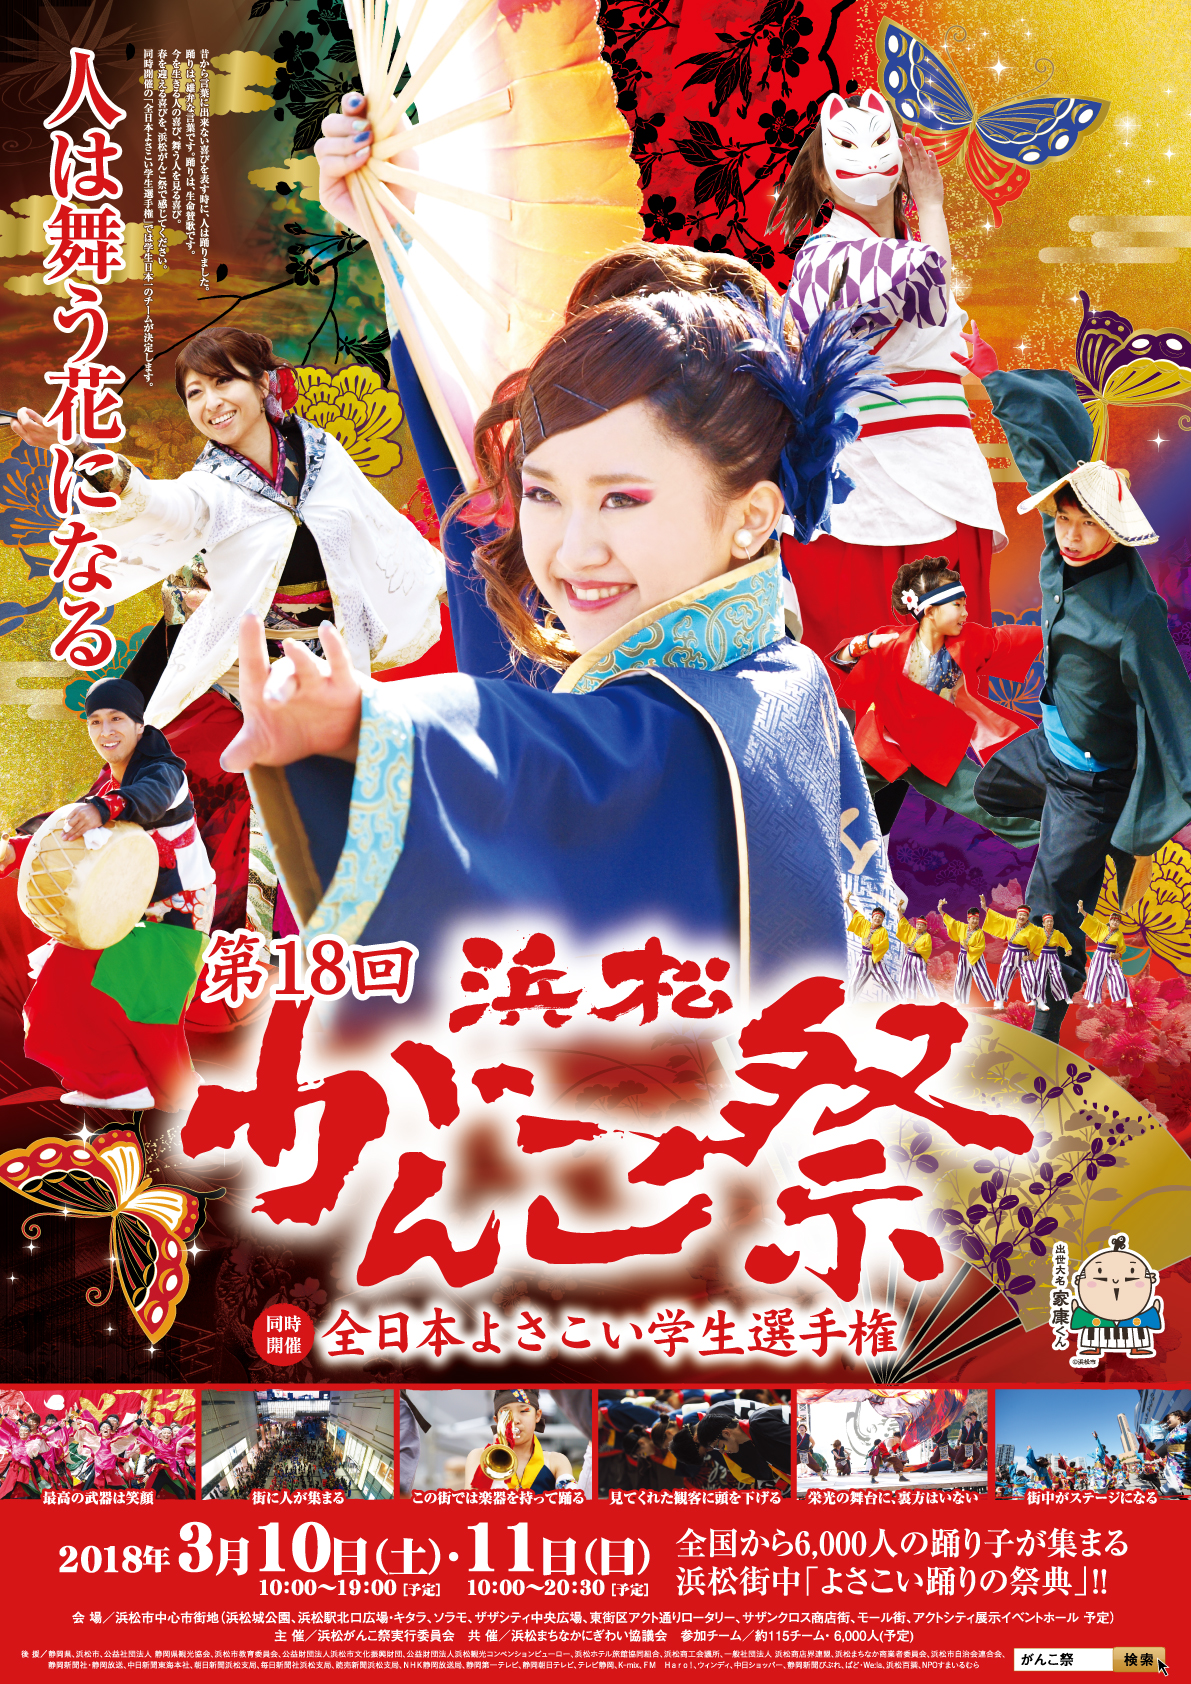 http://www.inhamamatsu.com/recommend/hgkm2018.jpg